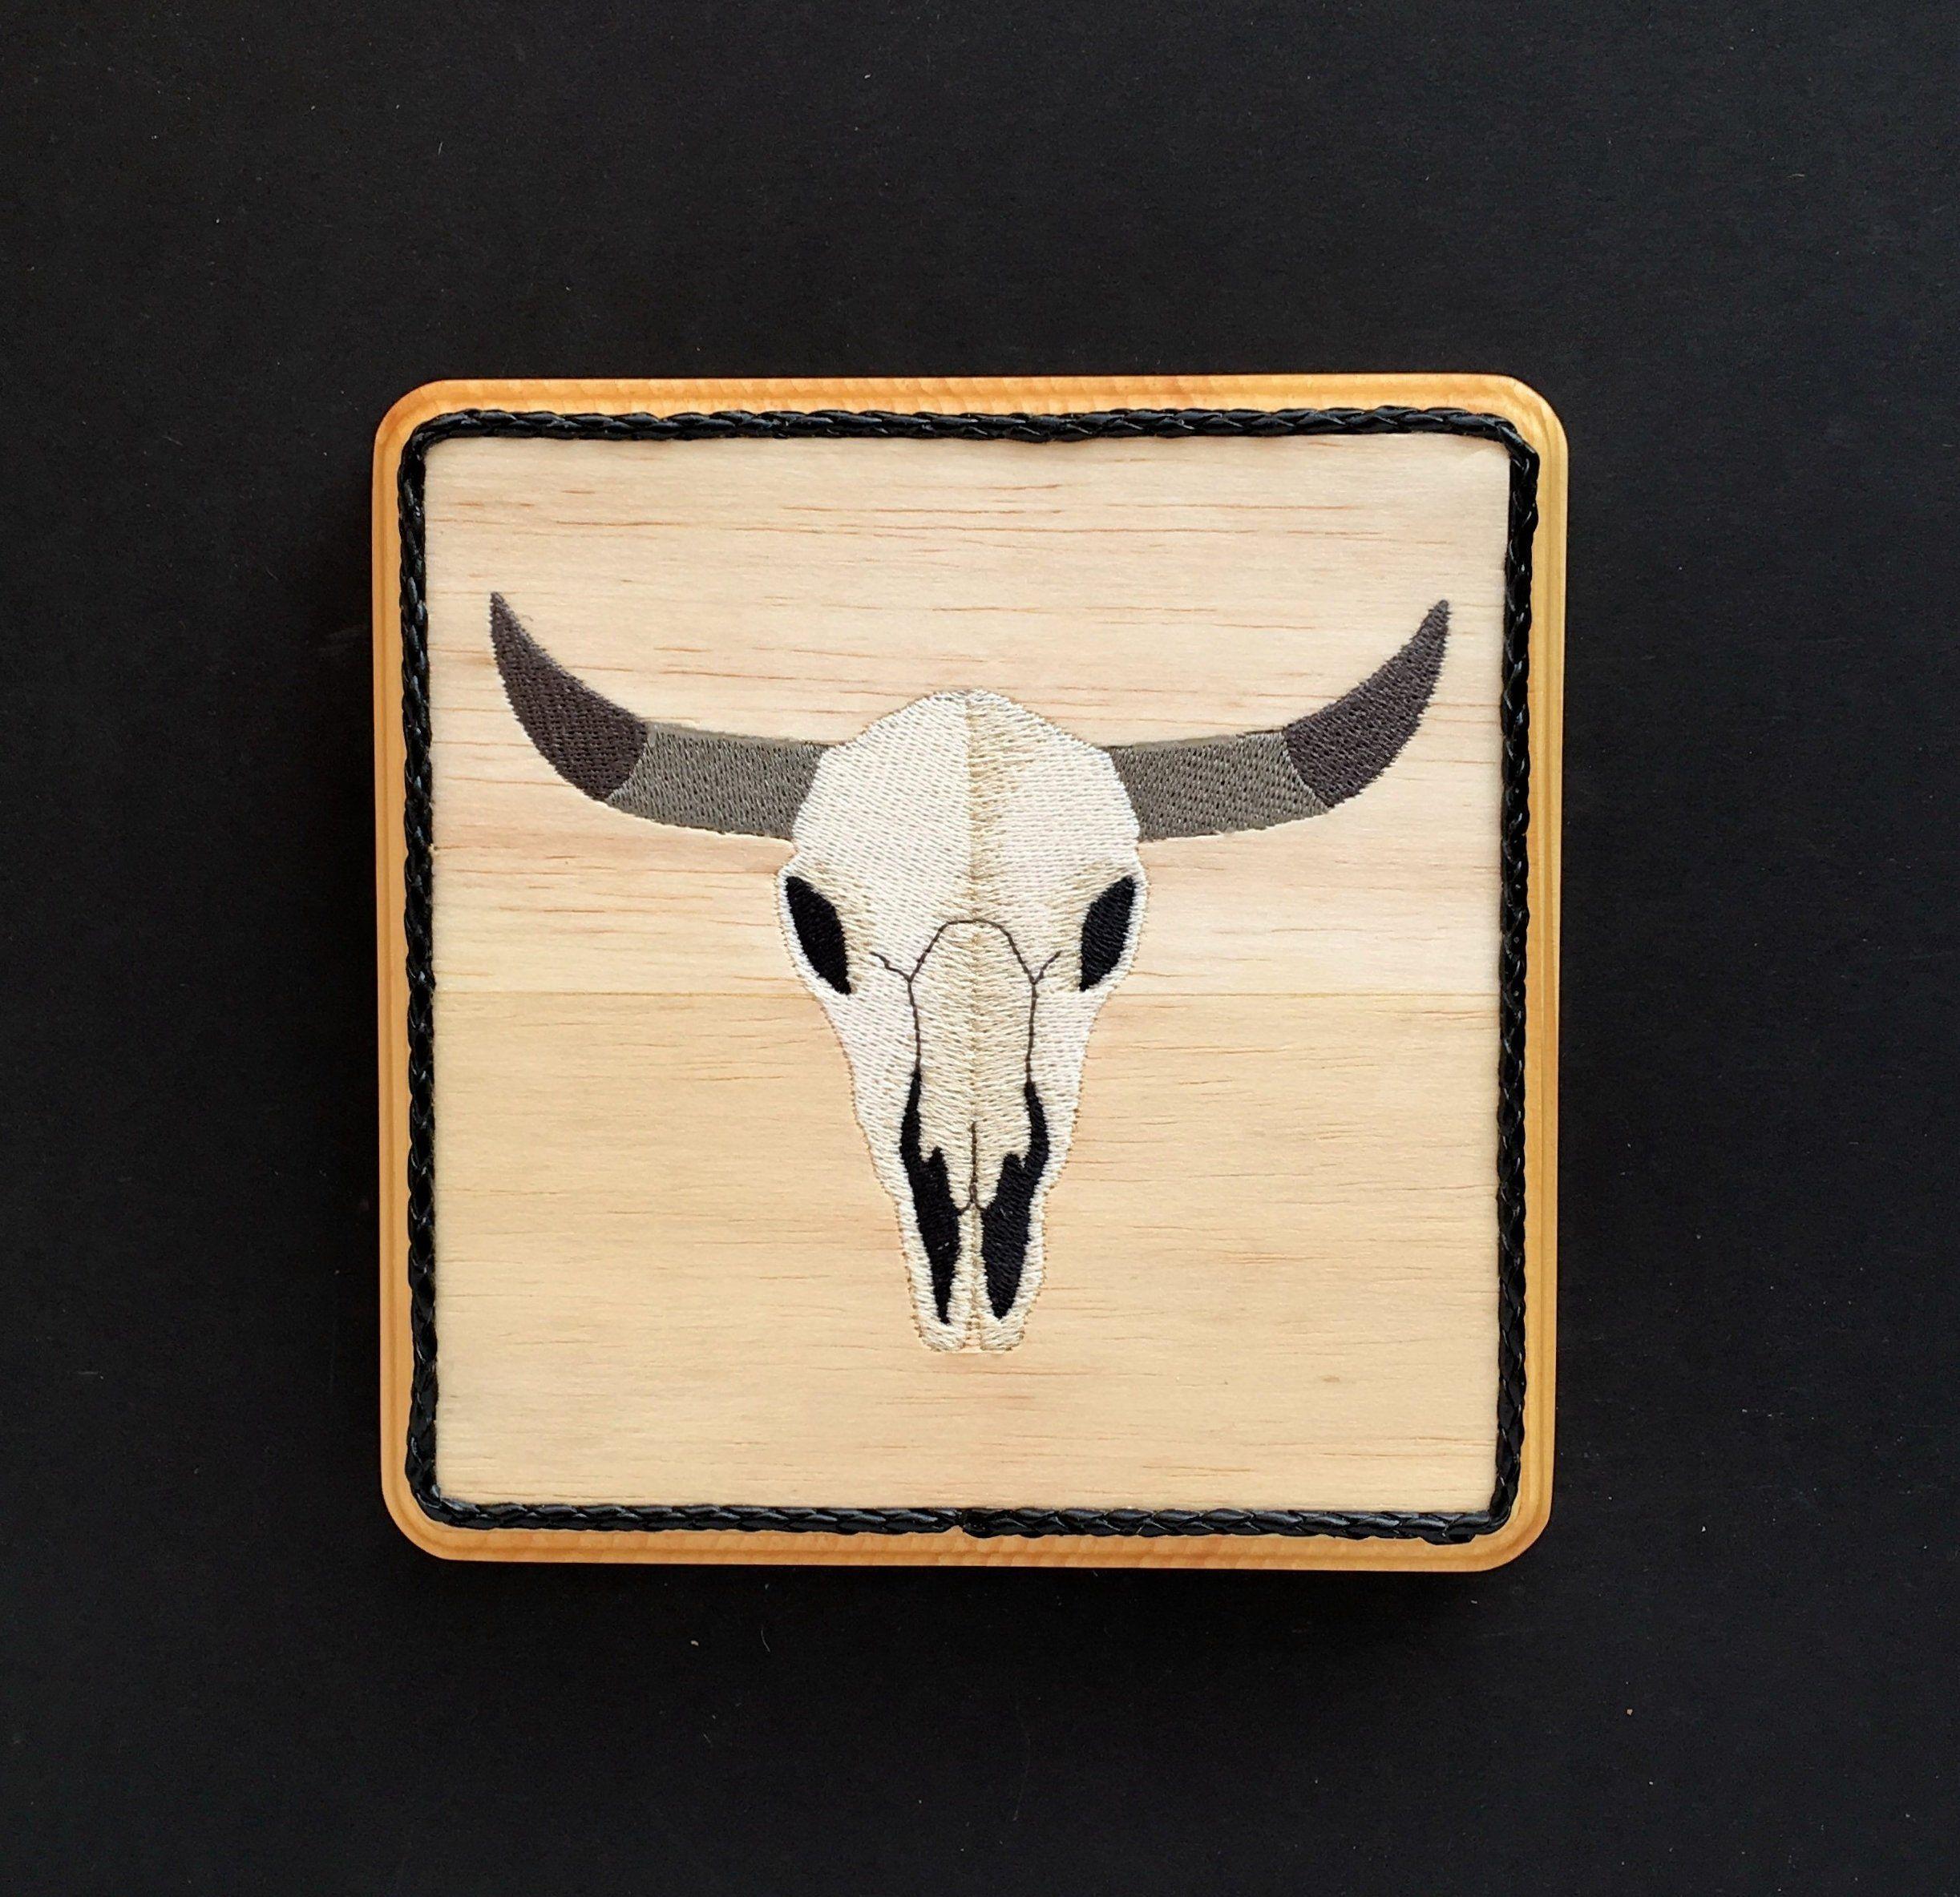 Western wall decor steer skull balsa wood embroidery art